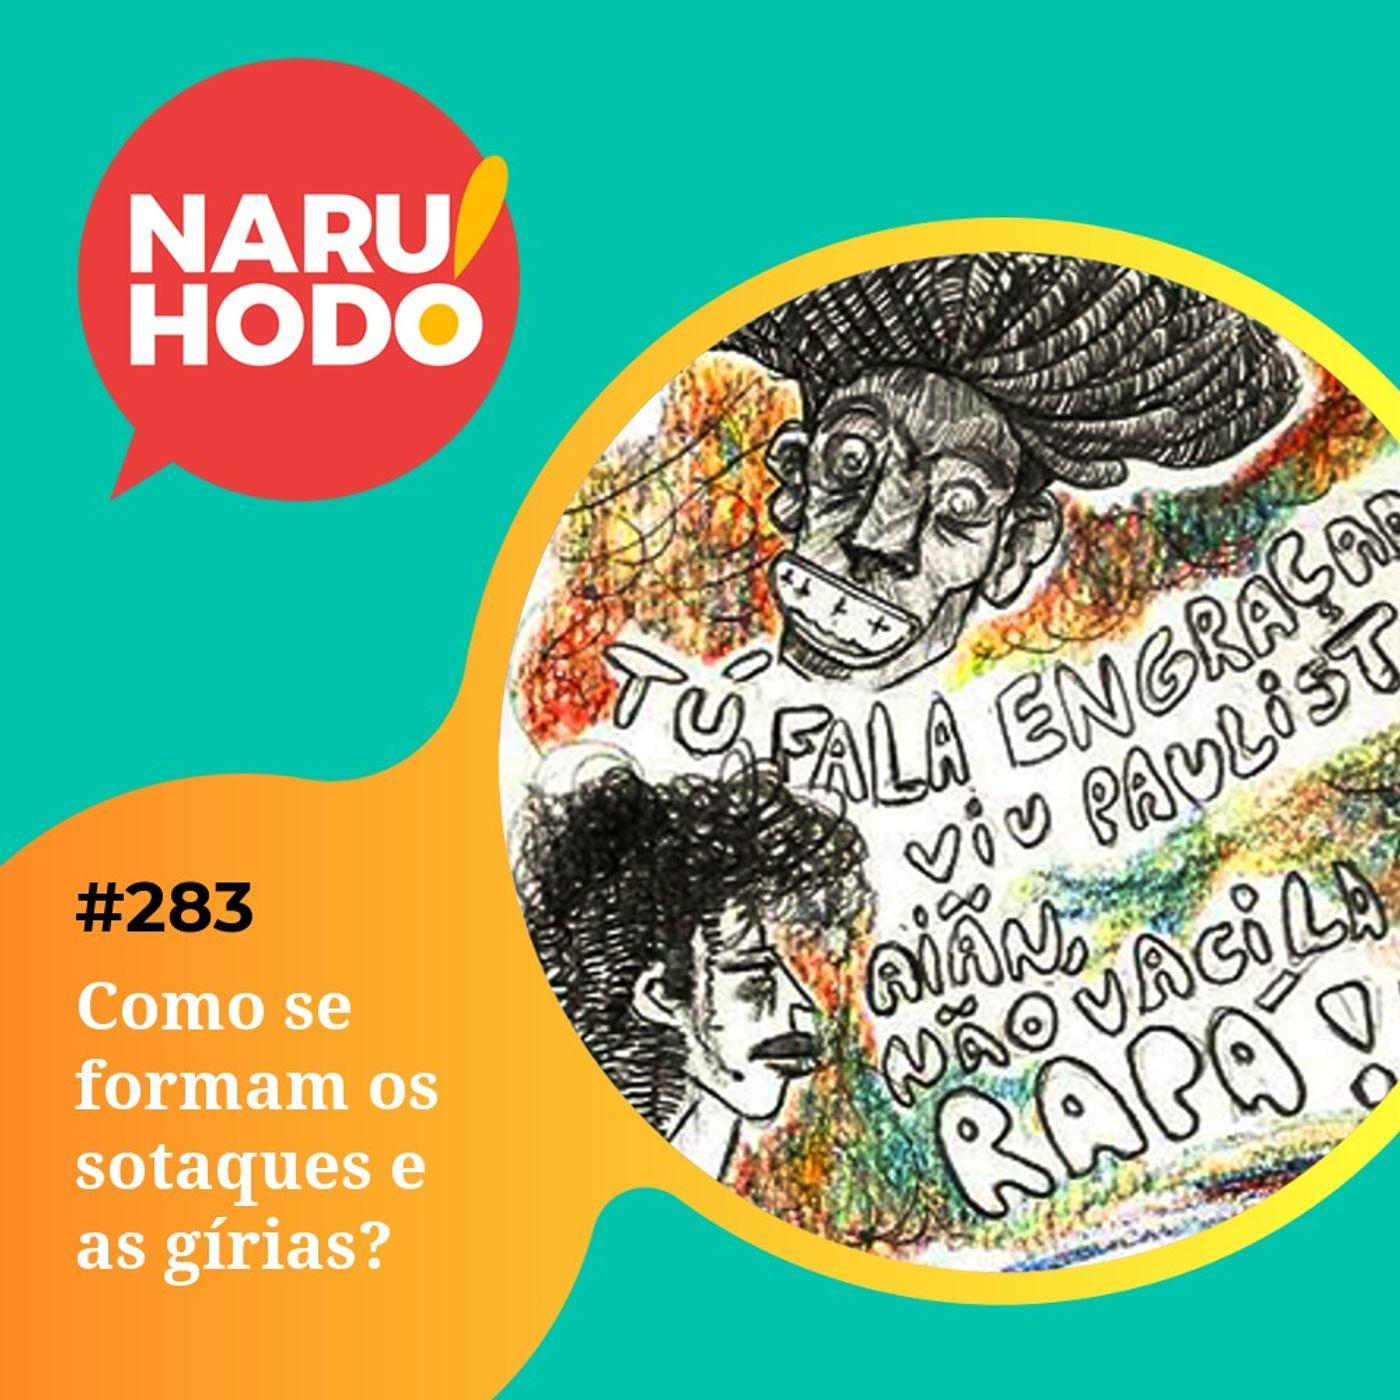 Naruhodo #283 - Como se formam os sotaques e as gírias?